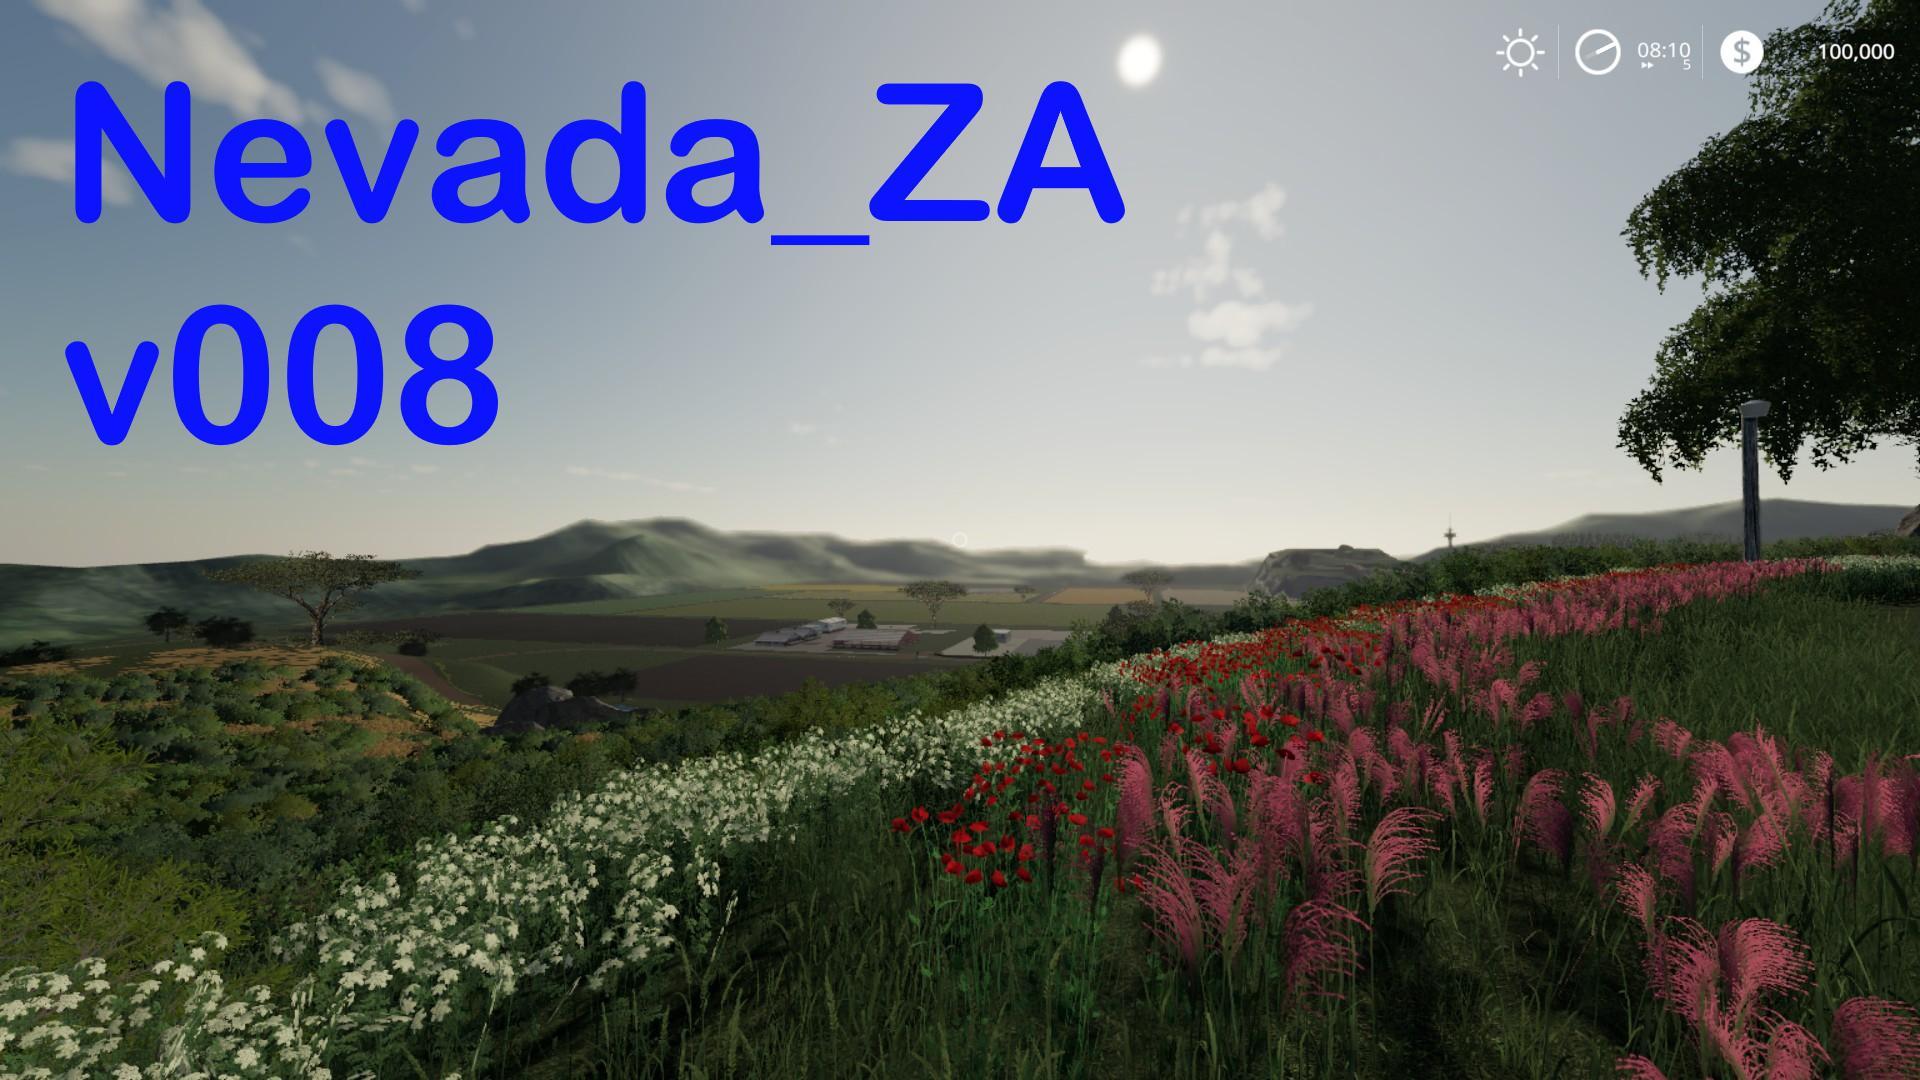 FS19 - Nevada ZA Seasons V008